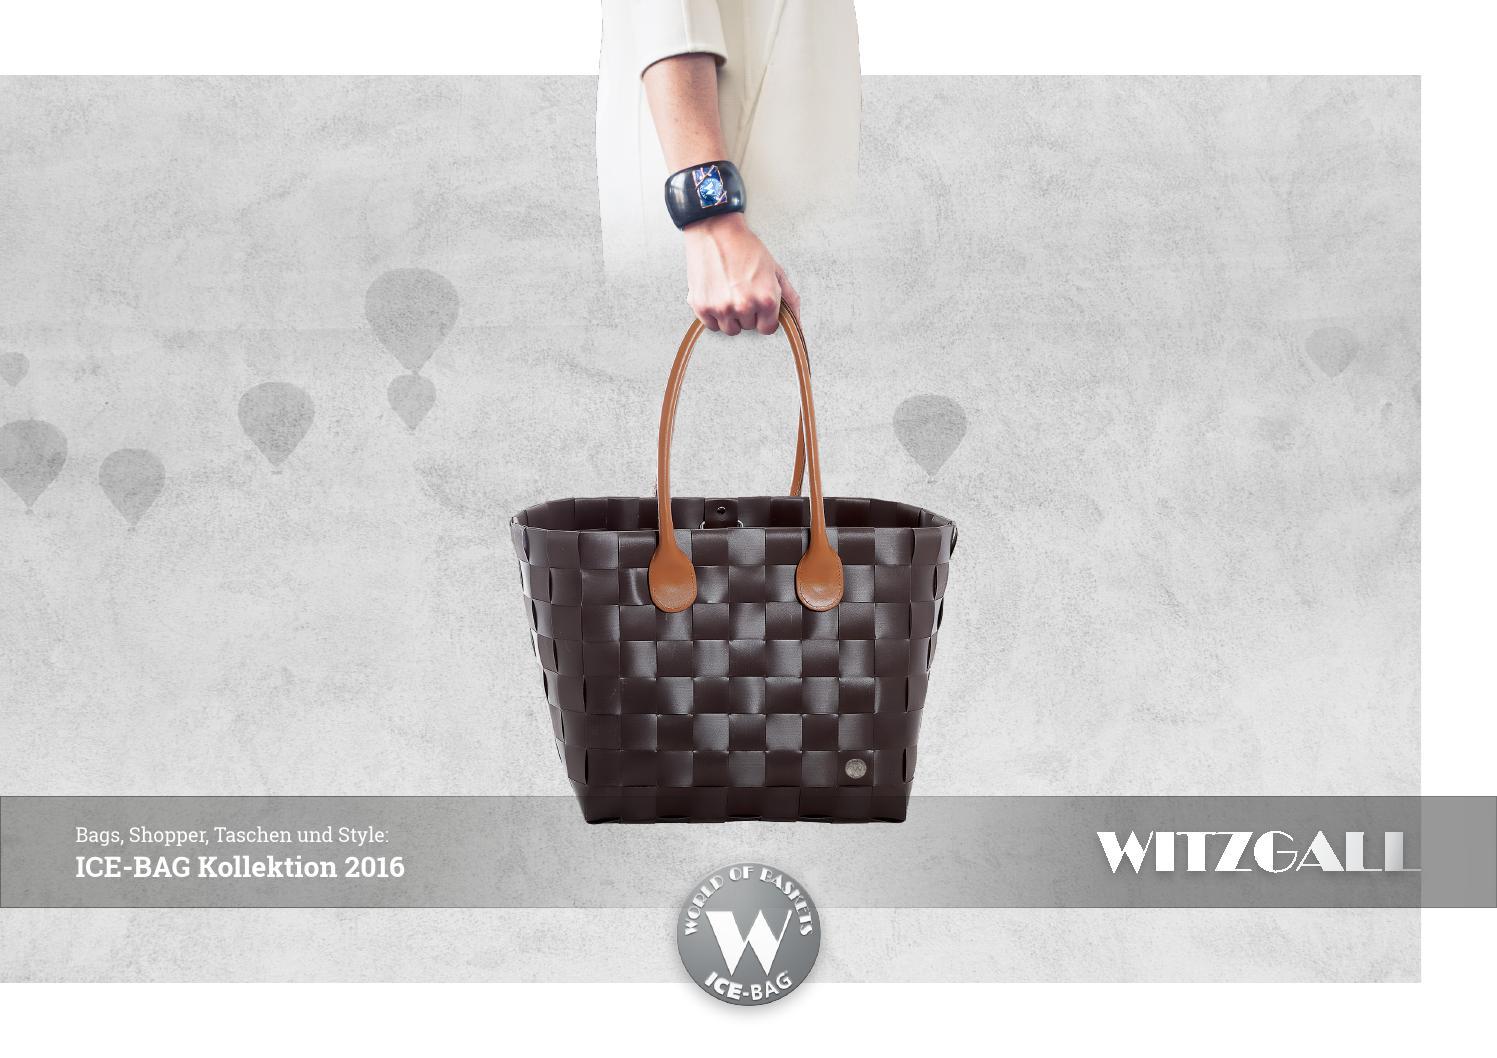 Witzgall 5006-23-0 Big City Shopper Ice-Bag Original 43 x 37 x 22 cm